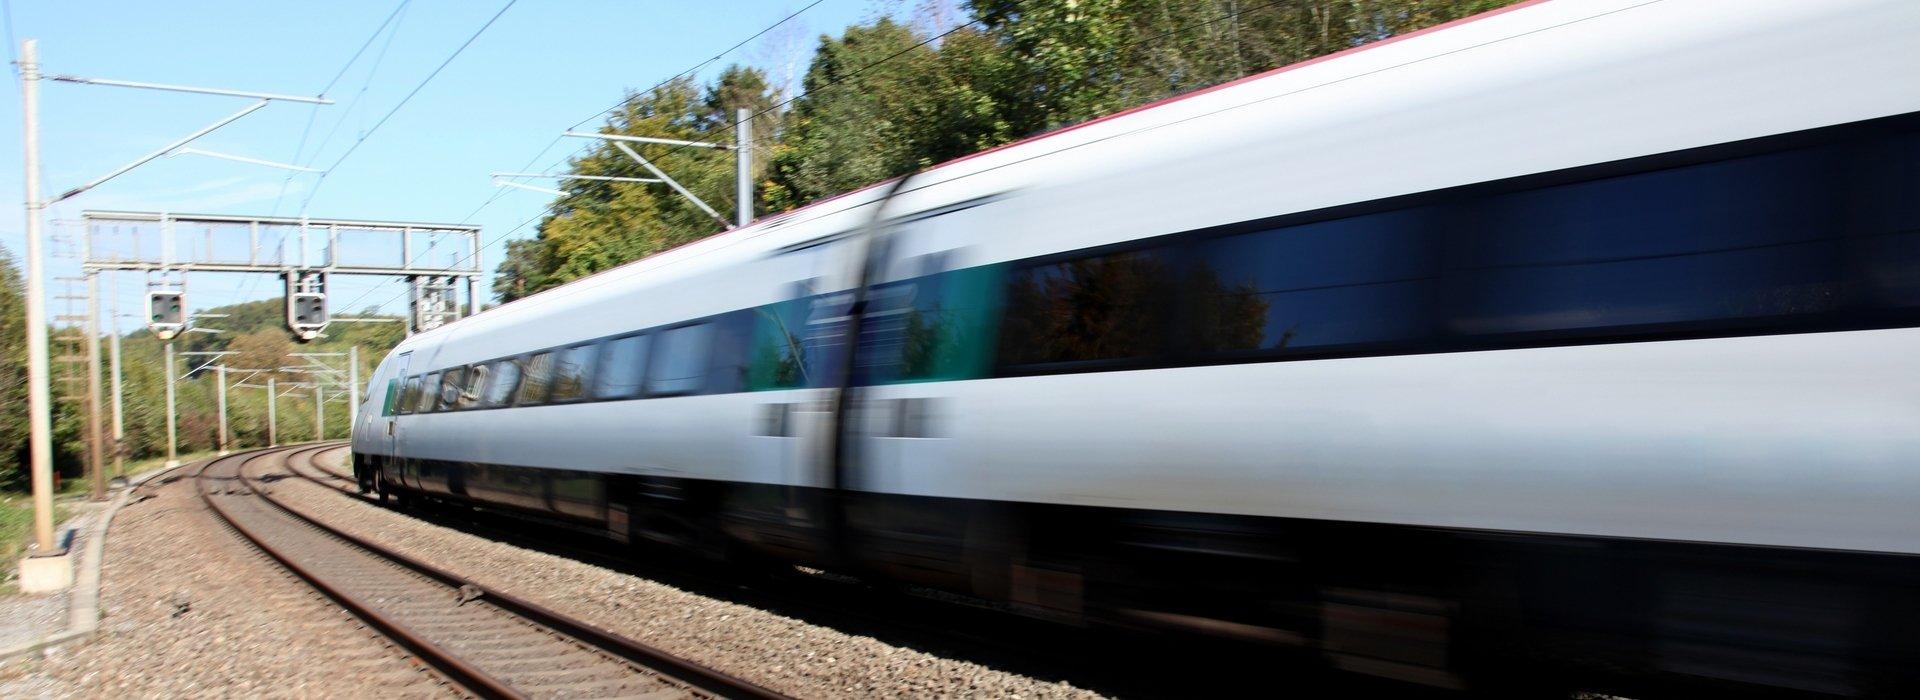 Utazás Budapestre Vonaton – Utazás Budapestre